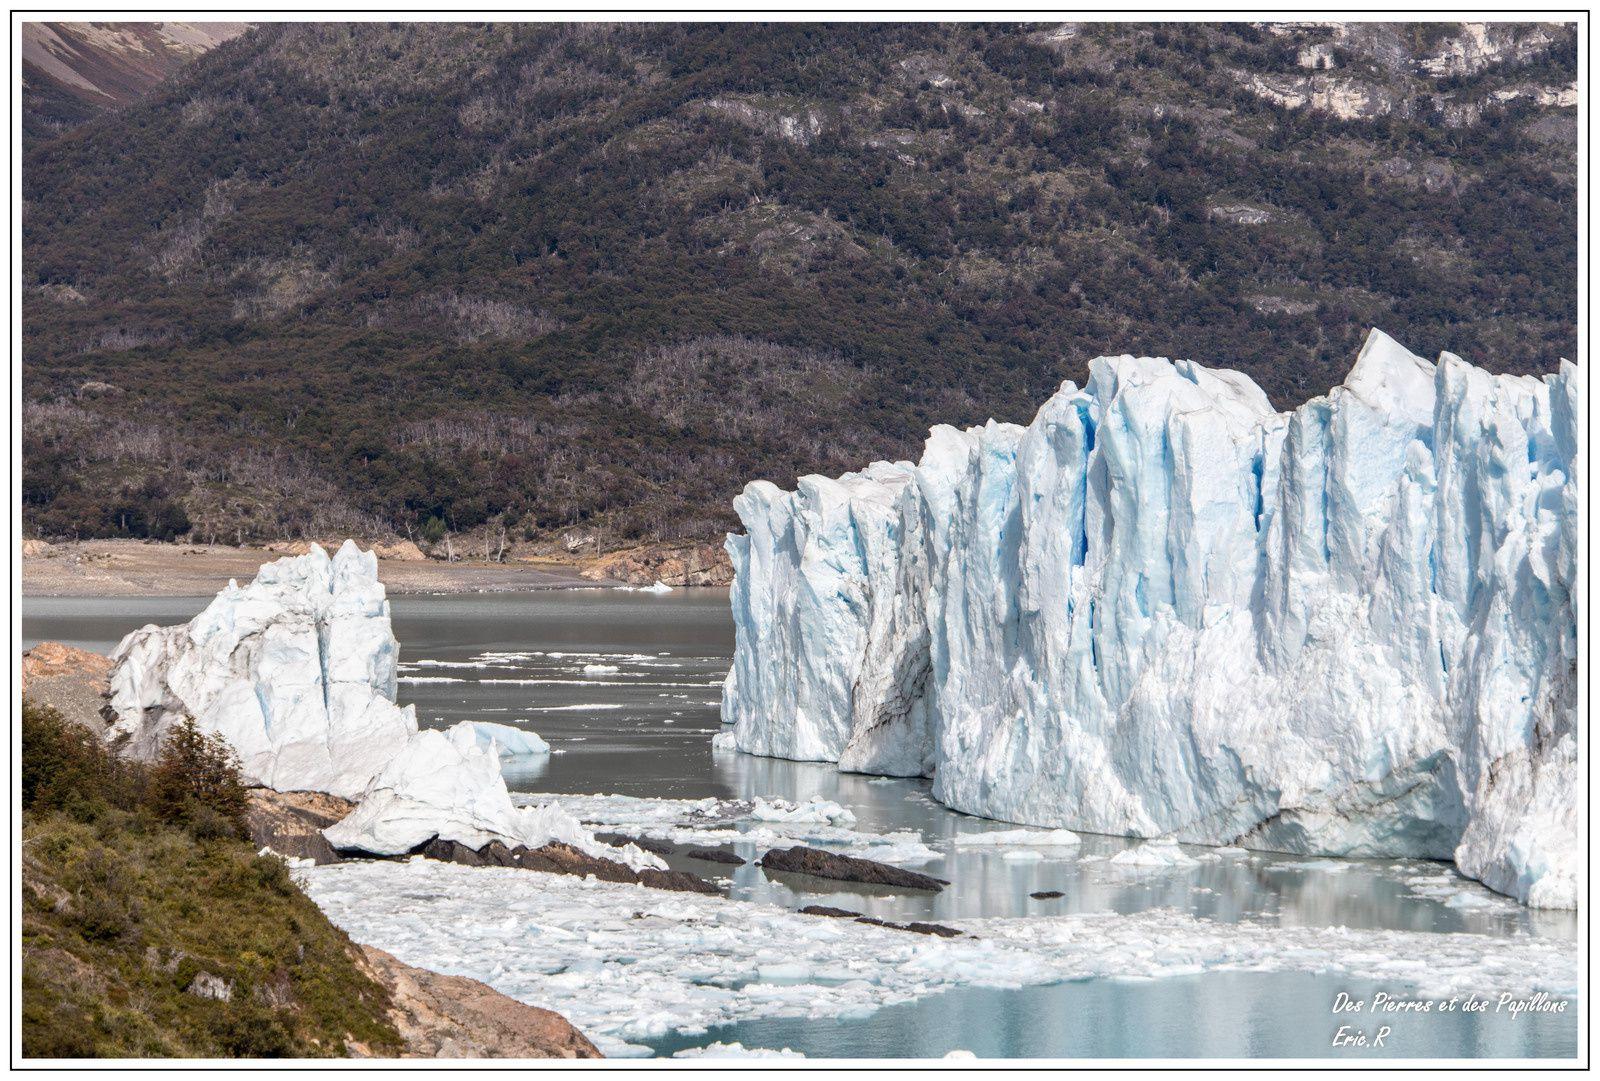 La zone de collision entre le glacier et la roche.